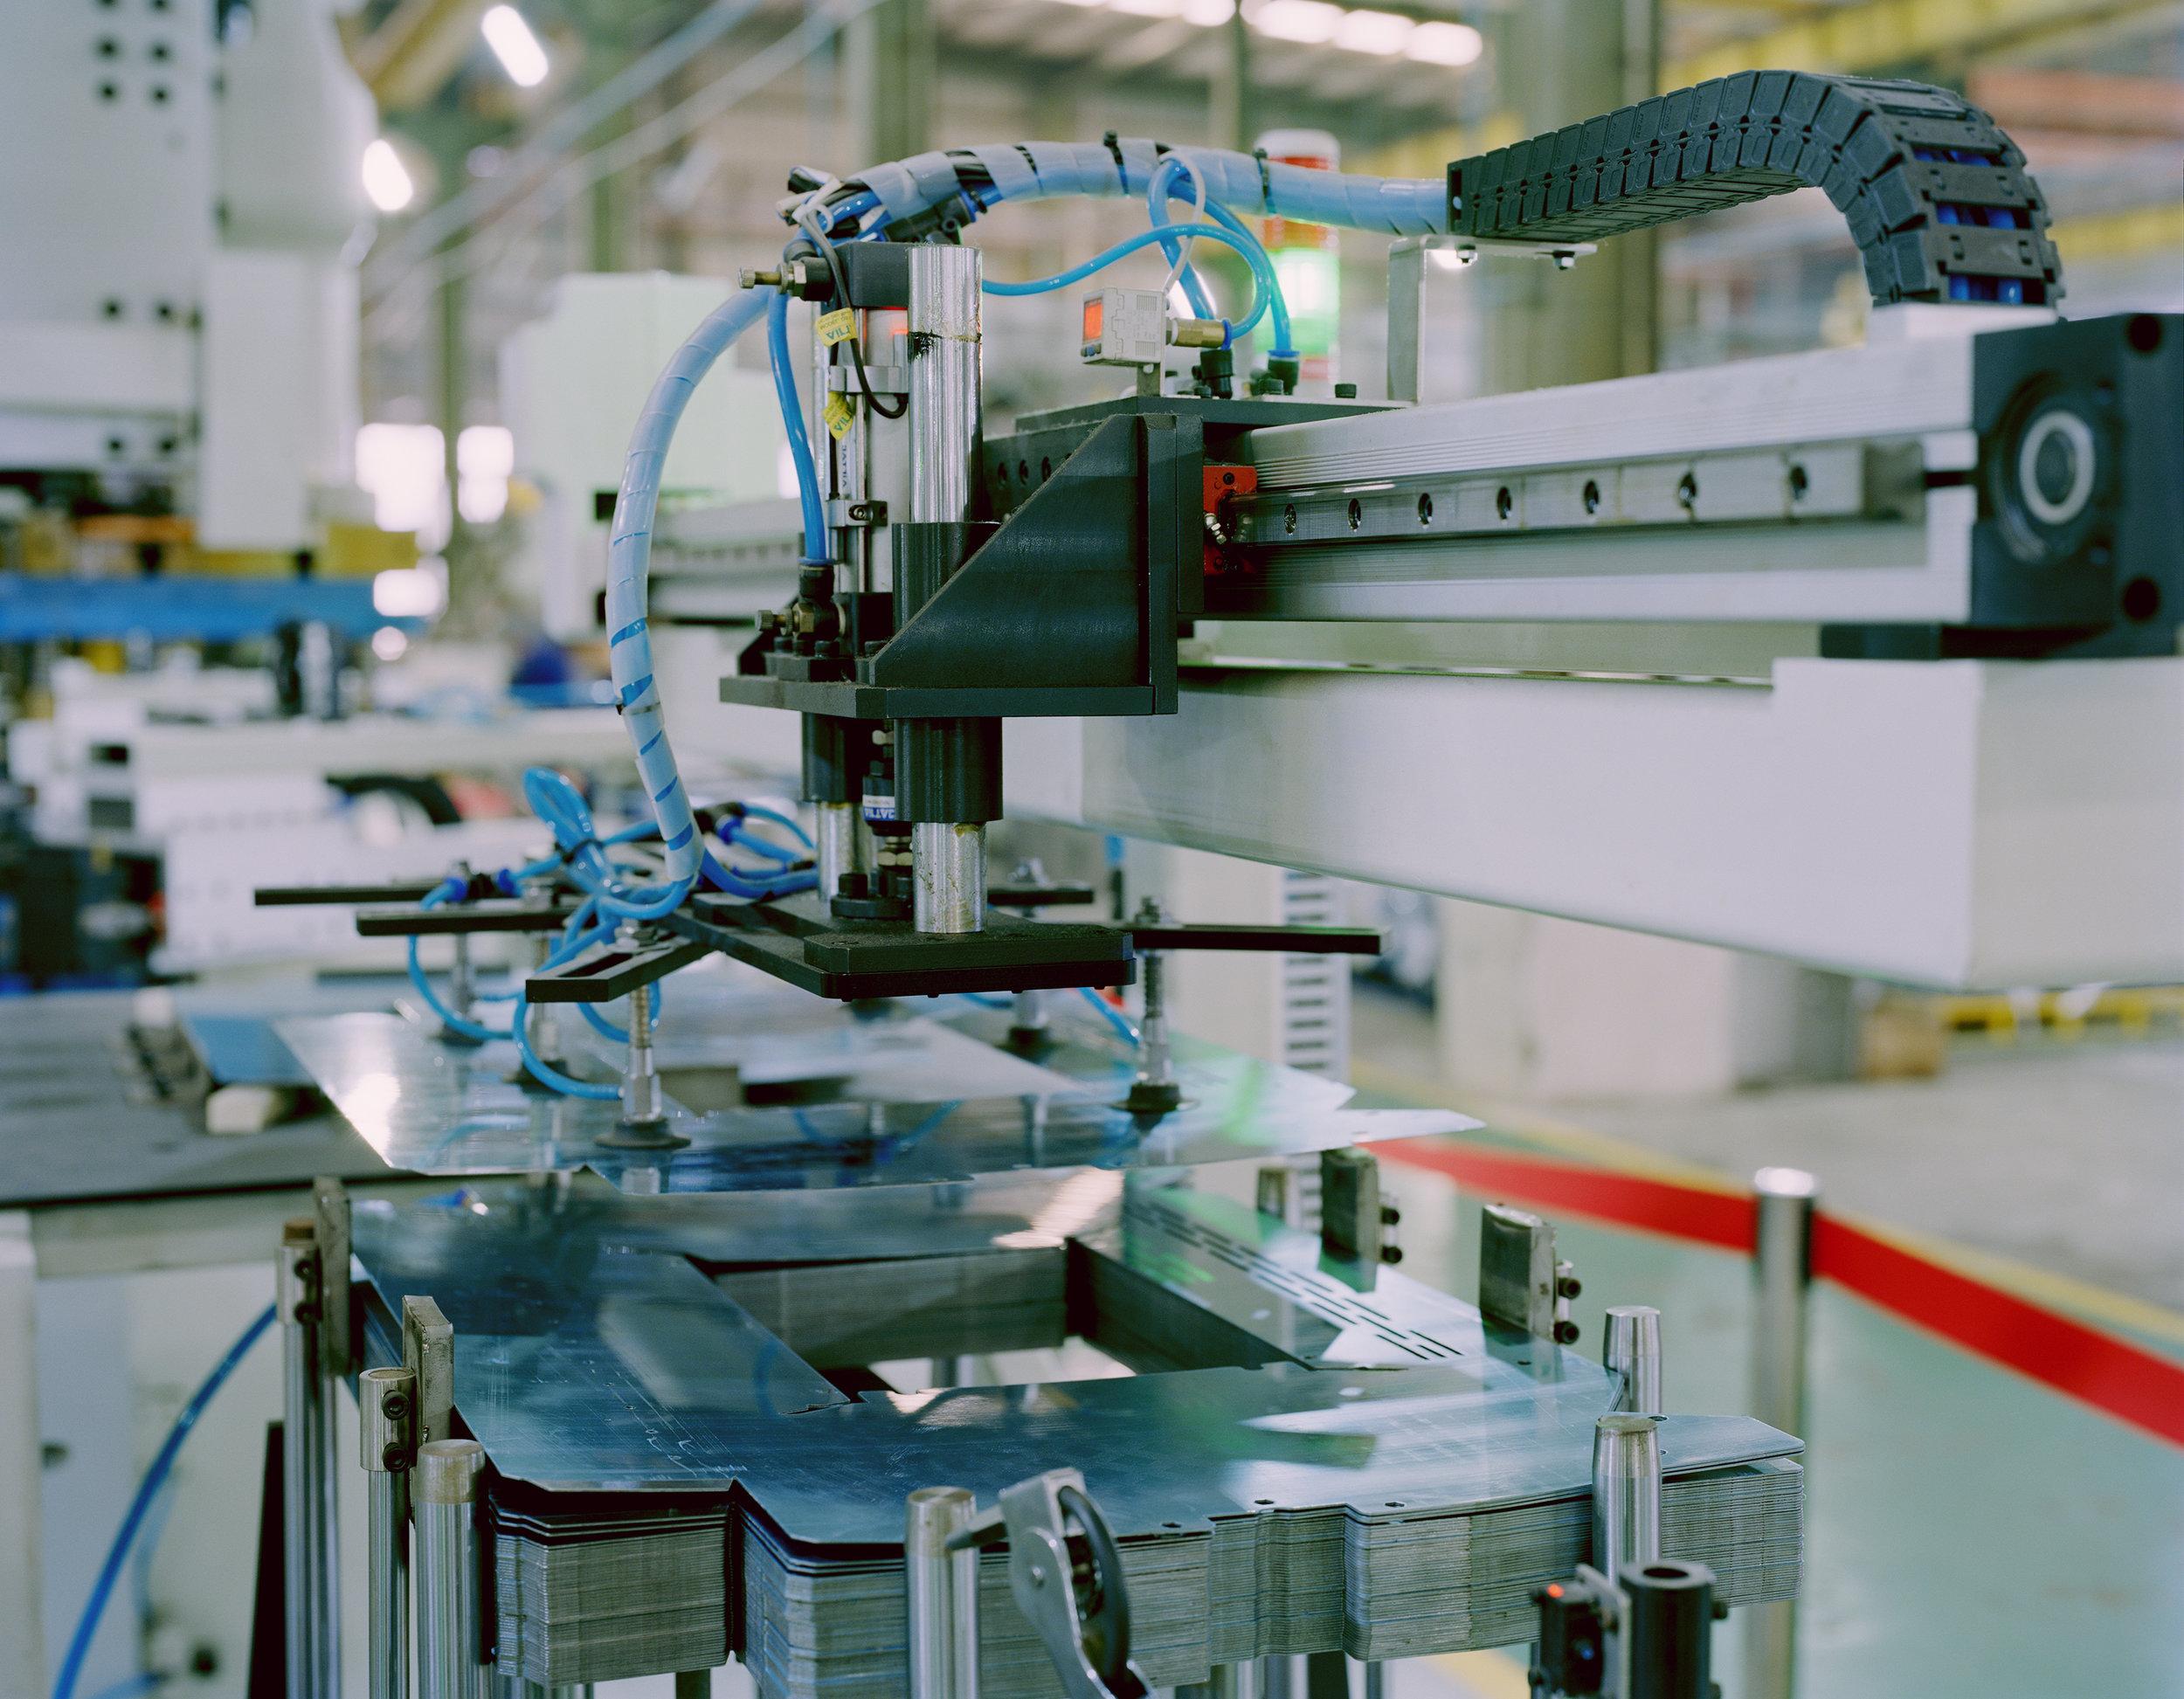 Robotic Welding , China  24x30 Archival Pigment Print  2016